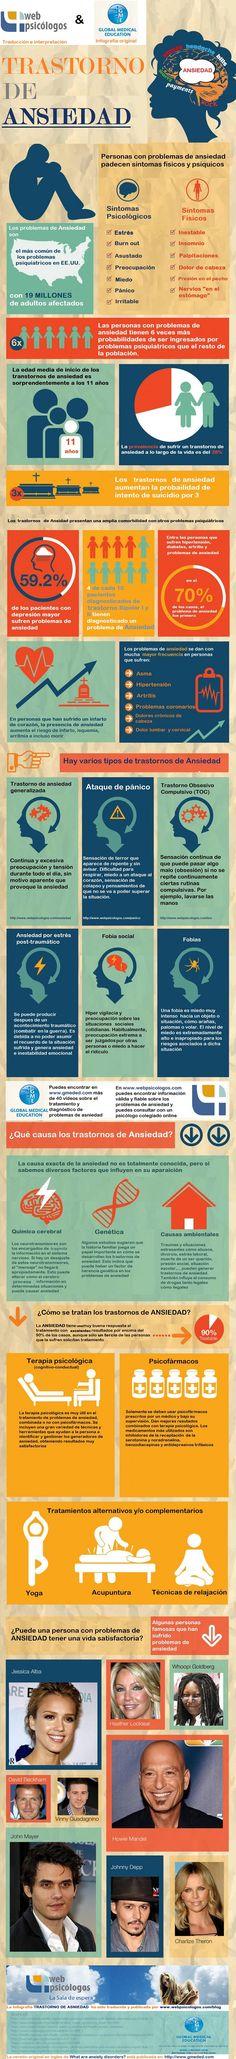 Trastorno de ansiedad Vía: www.webpsicologos.com/blog #infografia #infographic #health